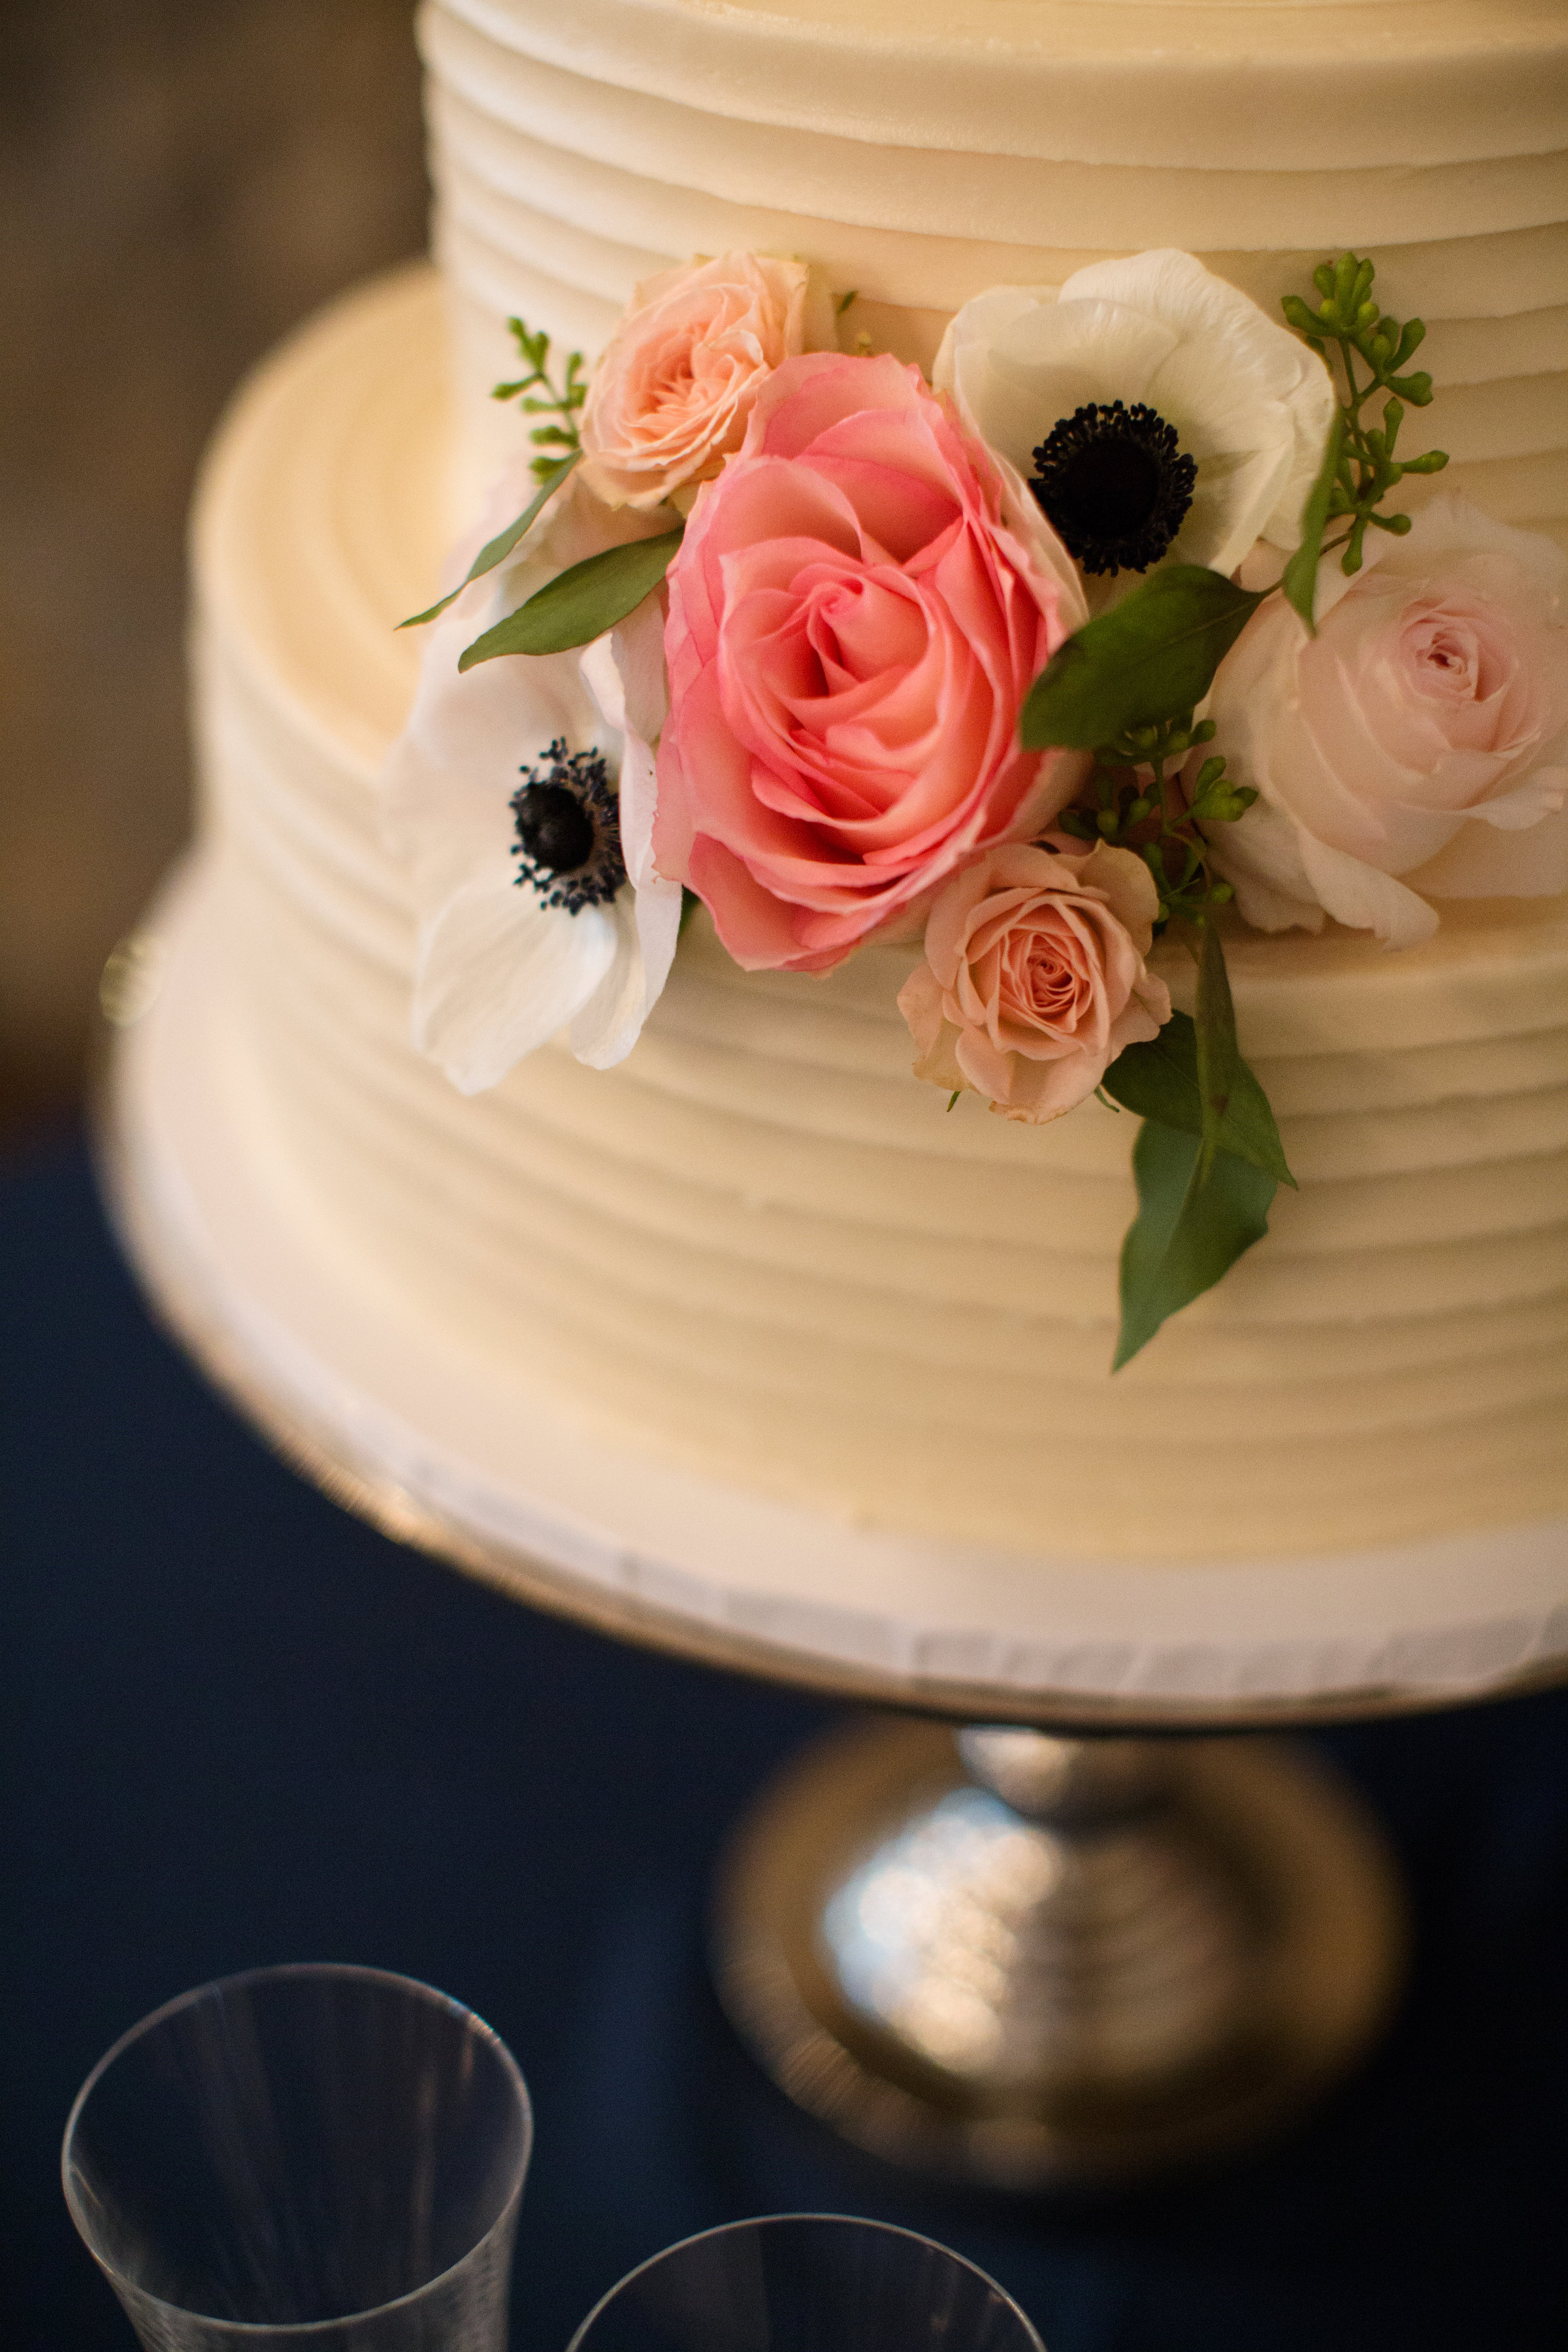 Ma Maison Austin Wedding Venue_ Austin Wedding Planner Heavenly Day Events _ Kristi Wright Austin Wedding Photographer20160306_0168.JPG